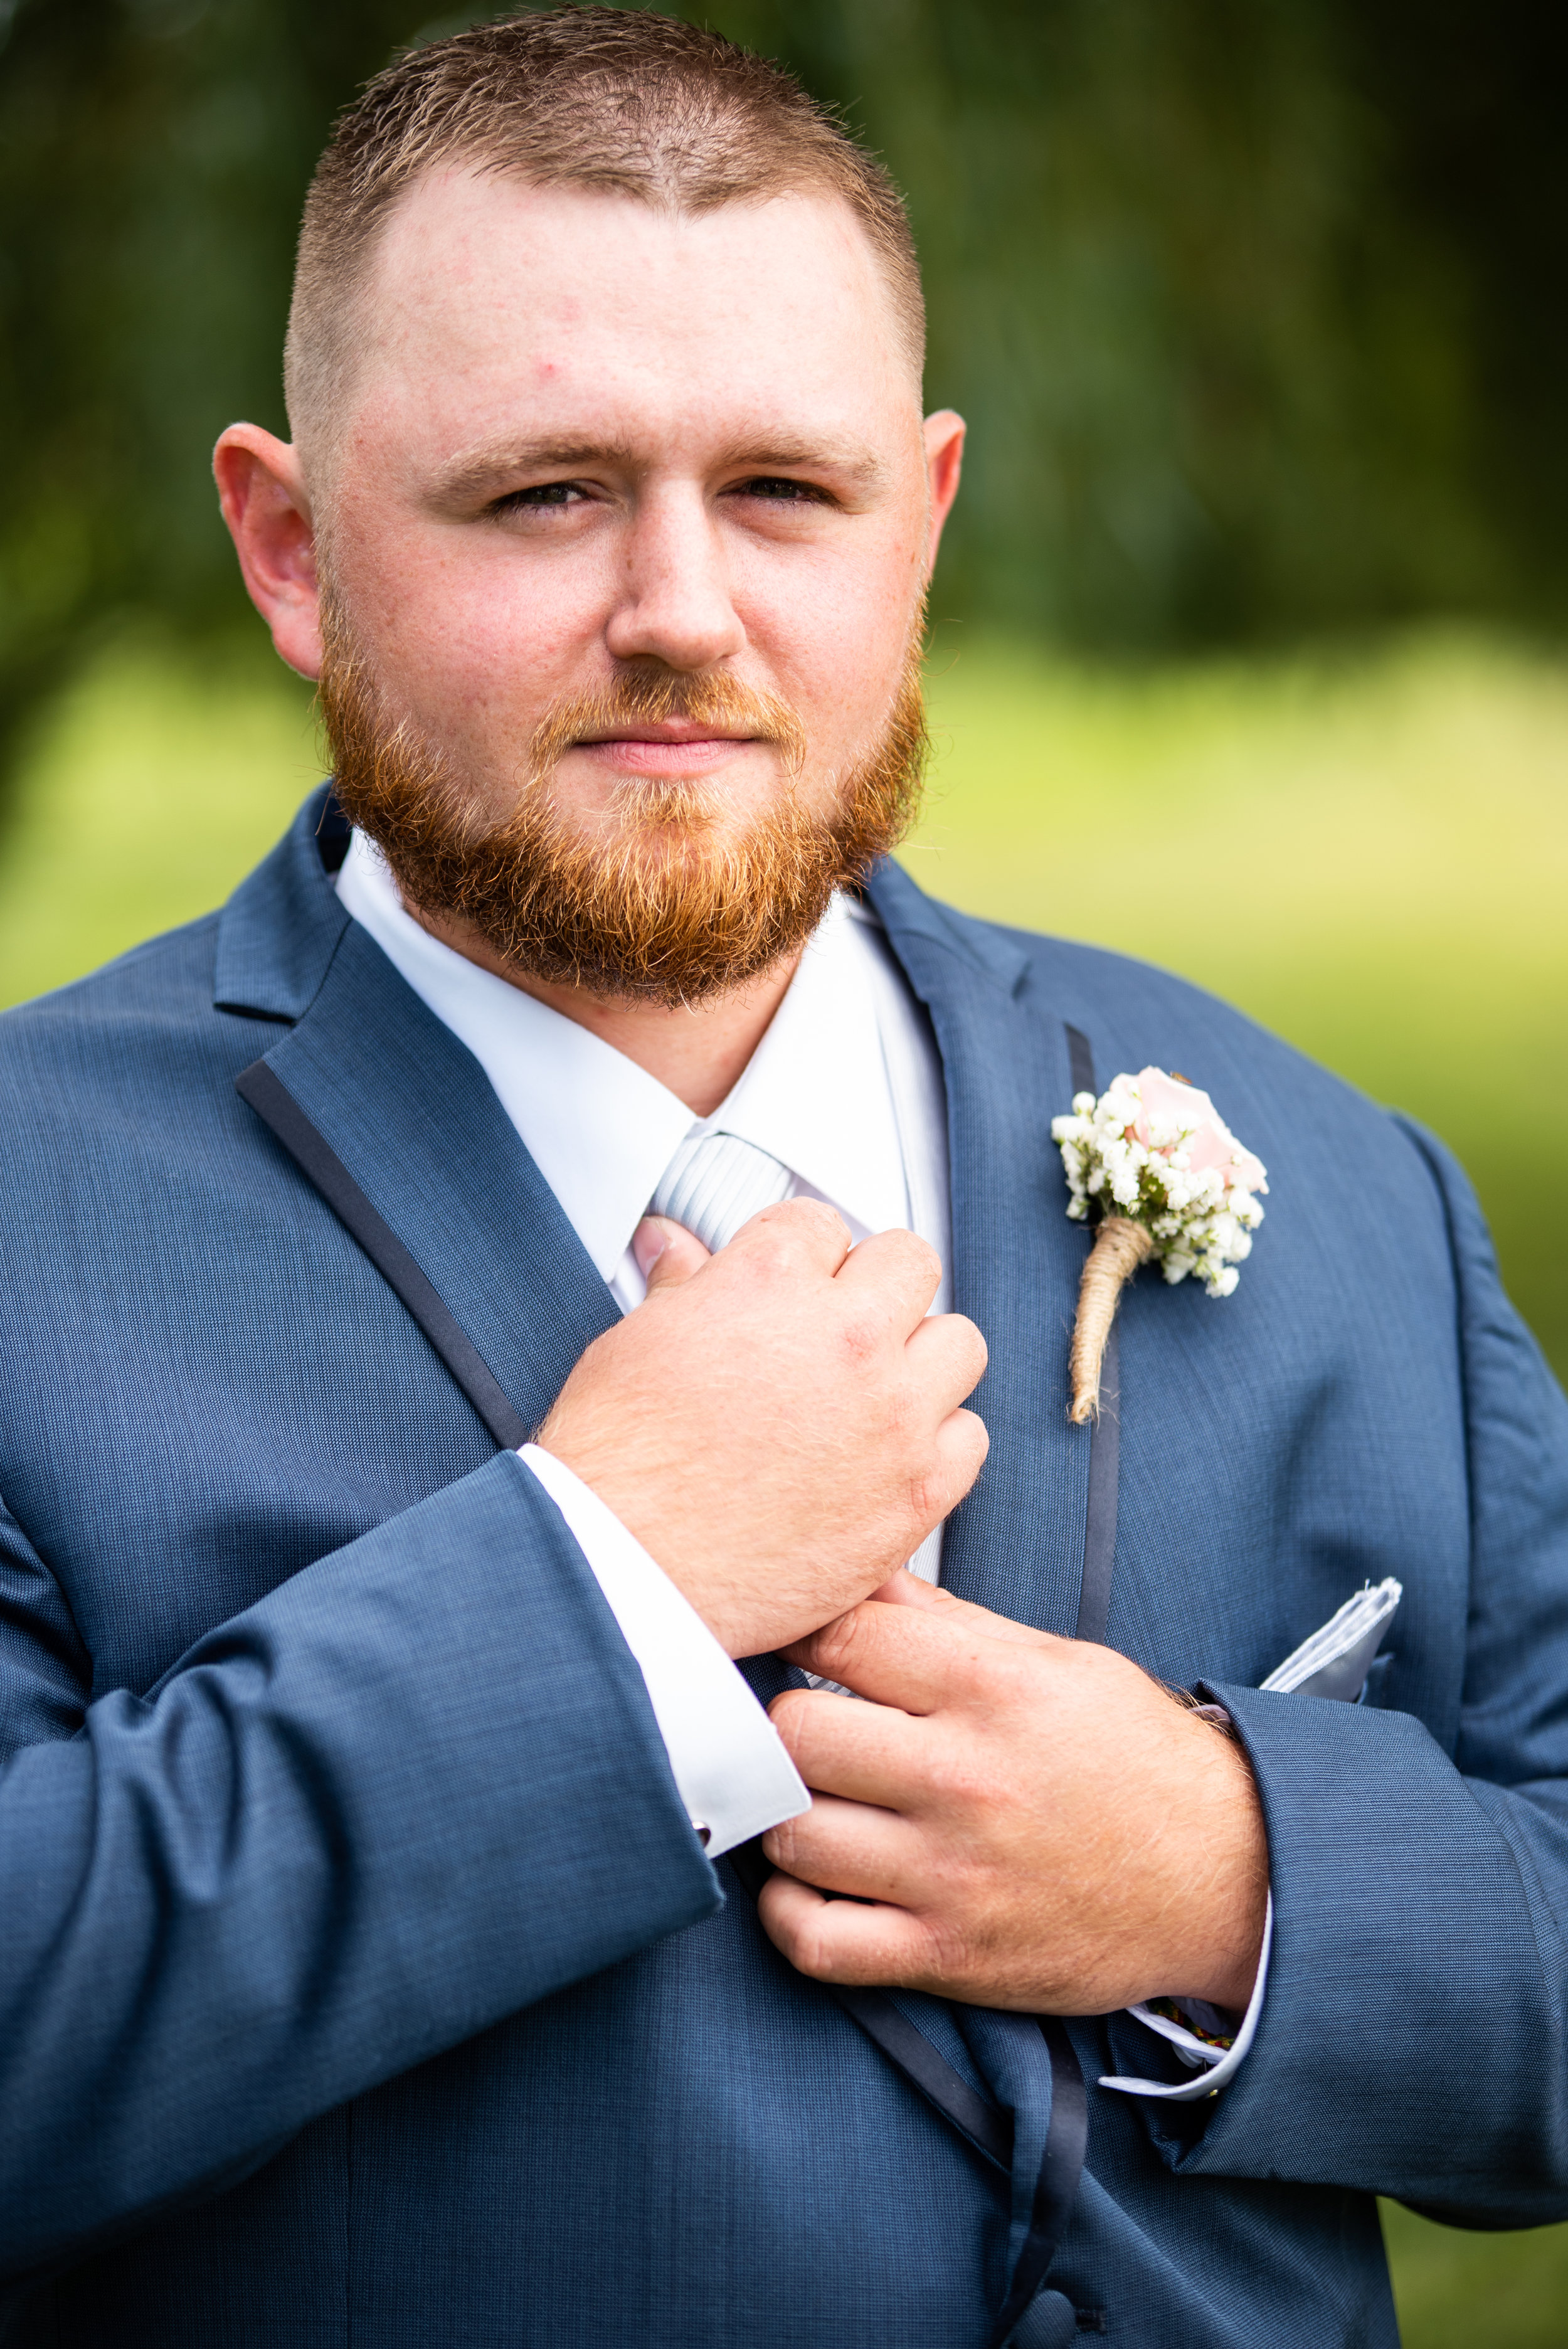 wedding (1 of 1)-60.jpg